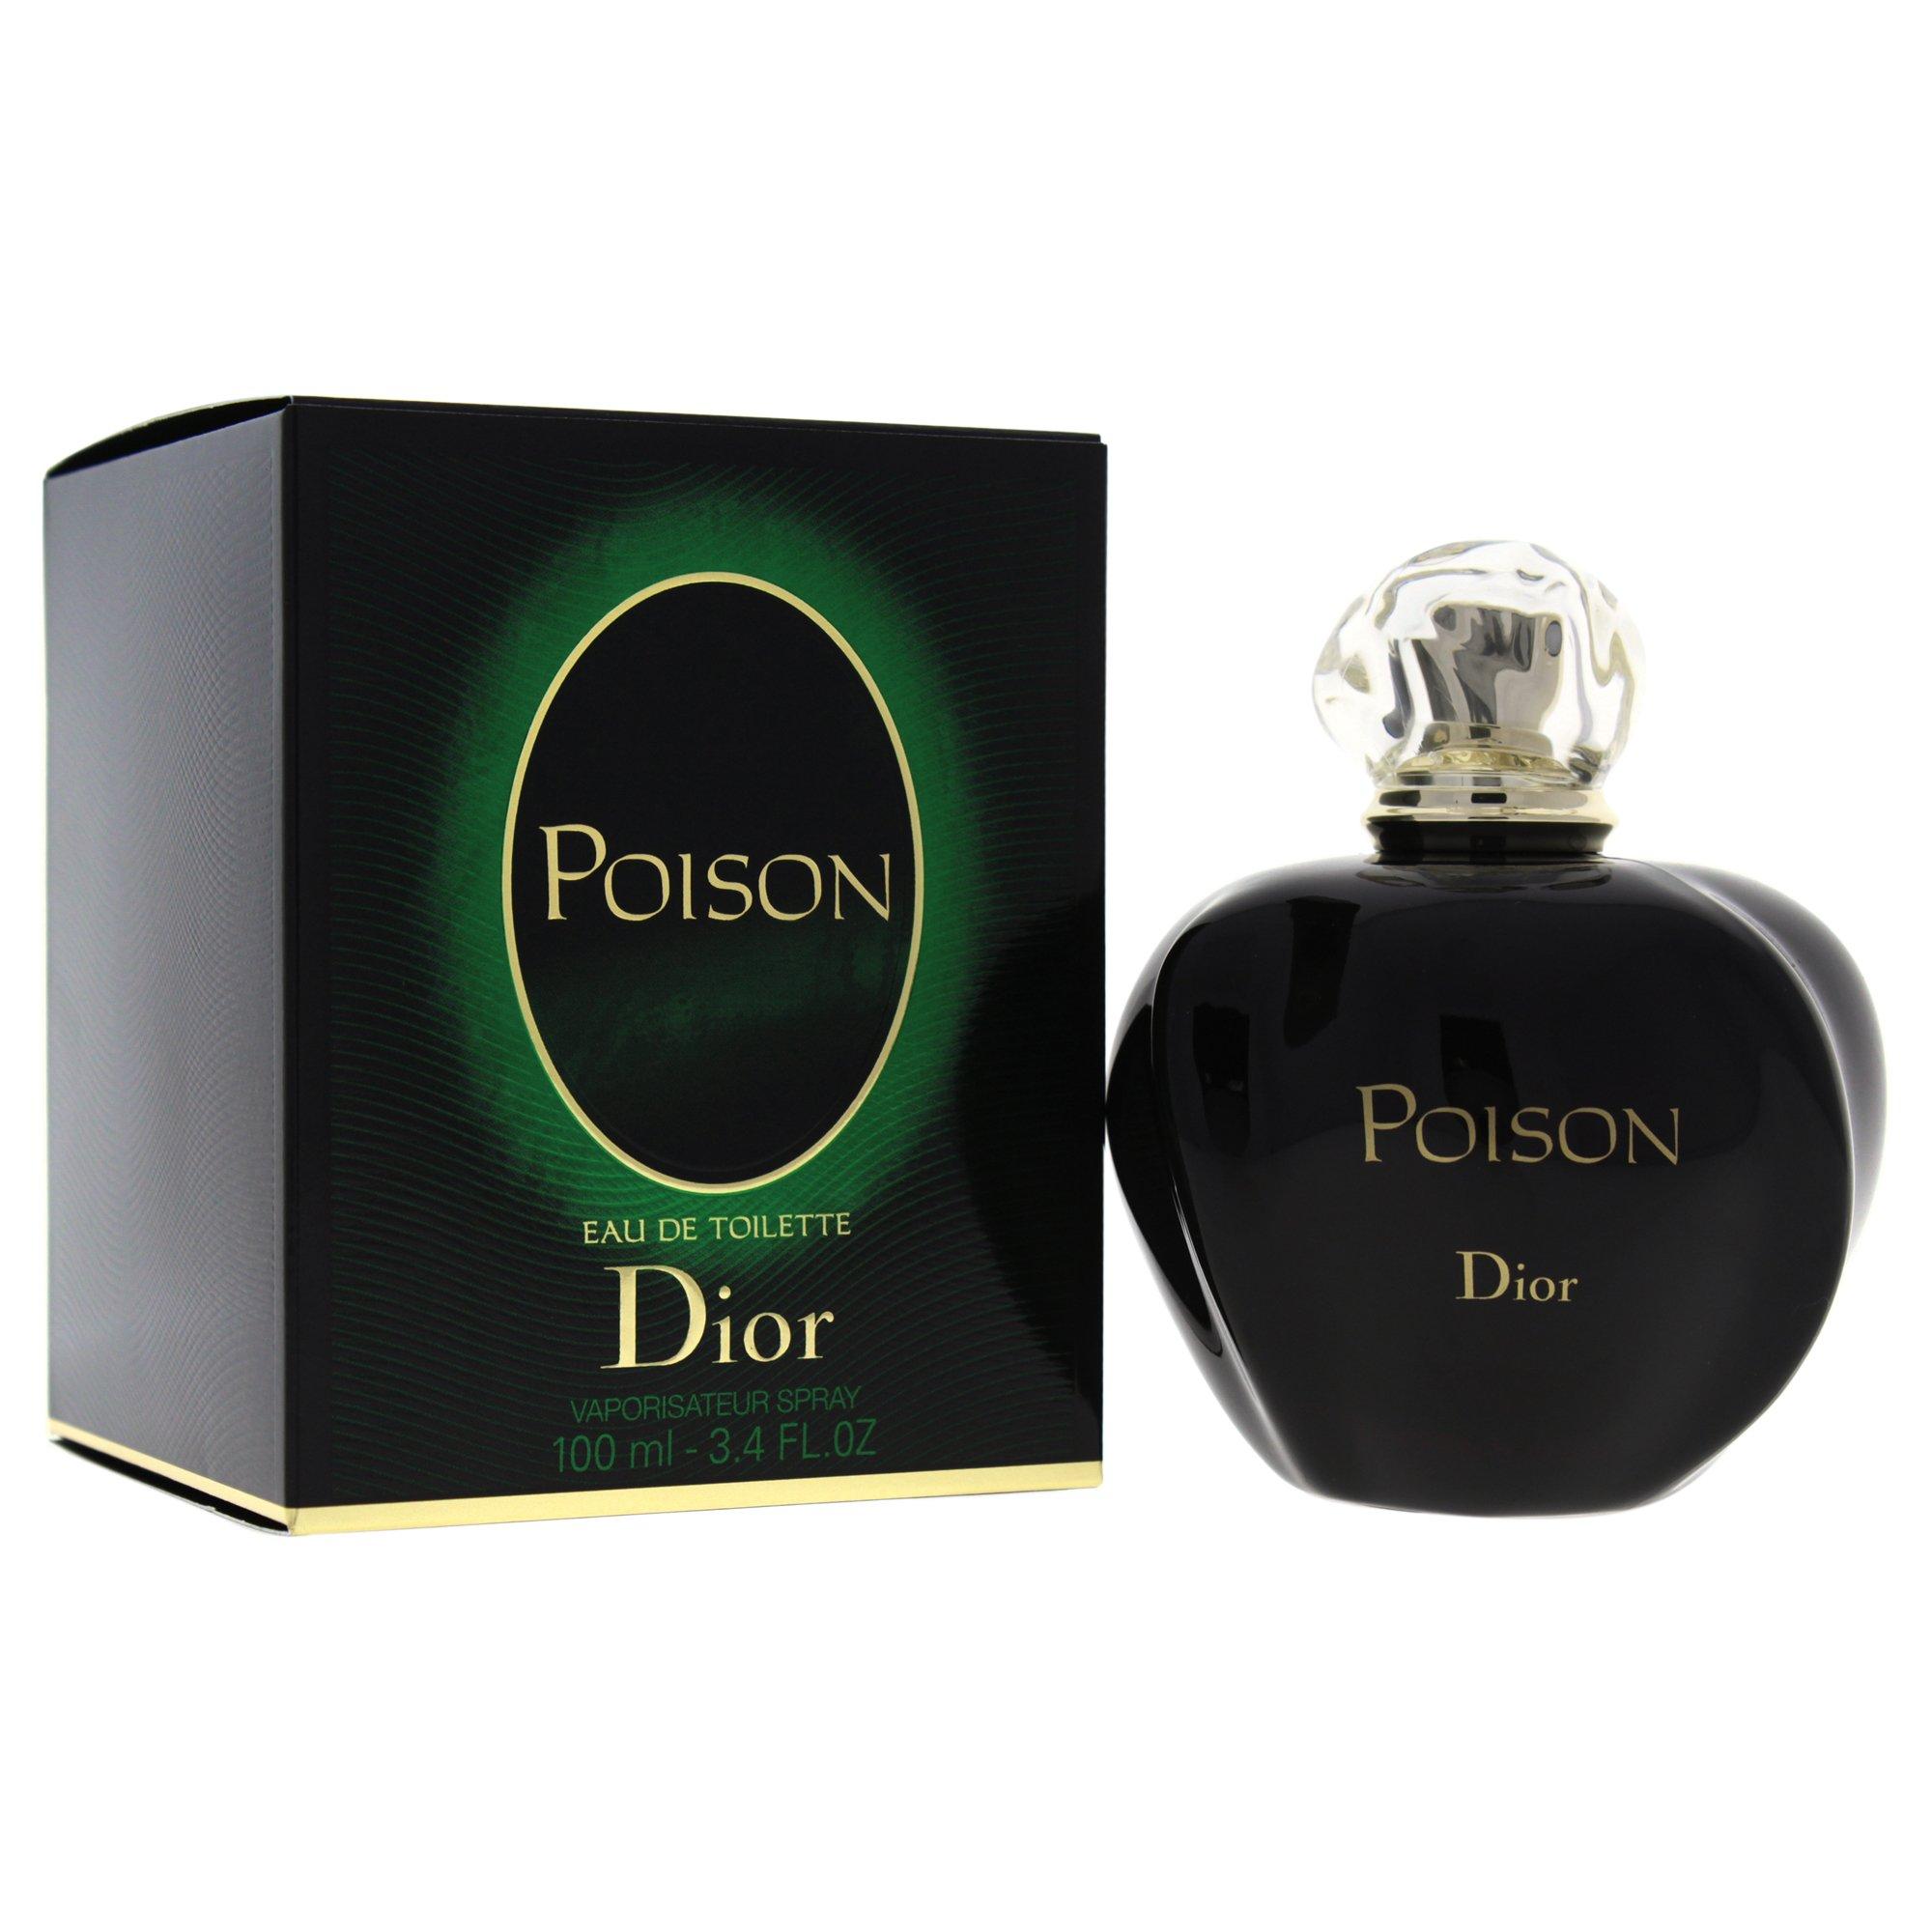 Christian Dior Poison Eau De Toilette Spray for Women, 3.4 Ounce